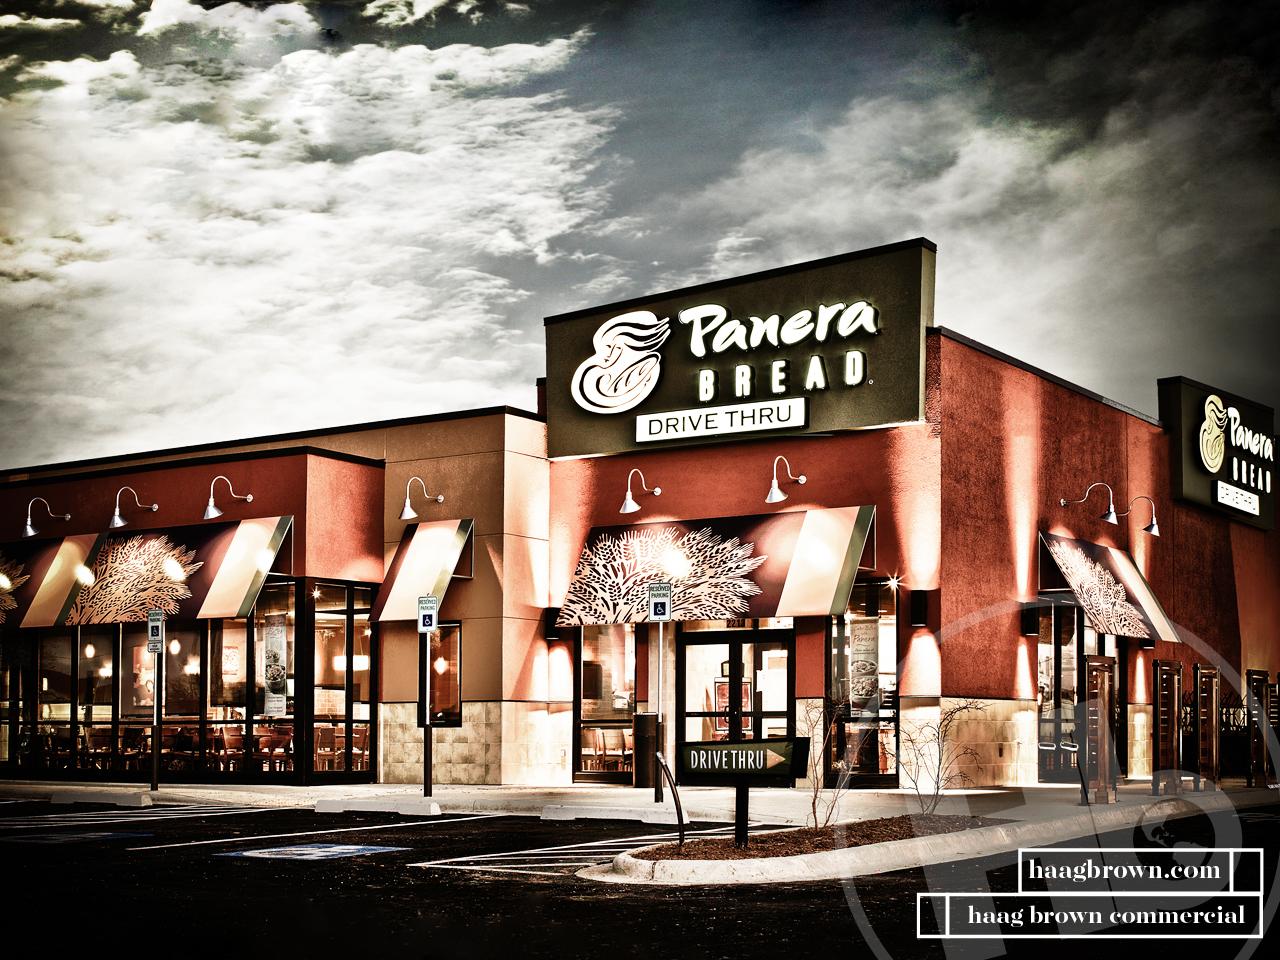 Panera Bread in Jonesboro, AR